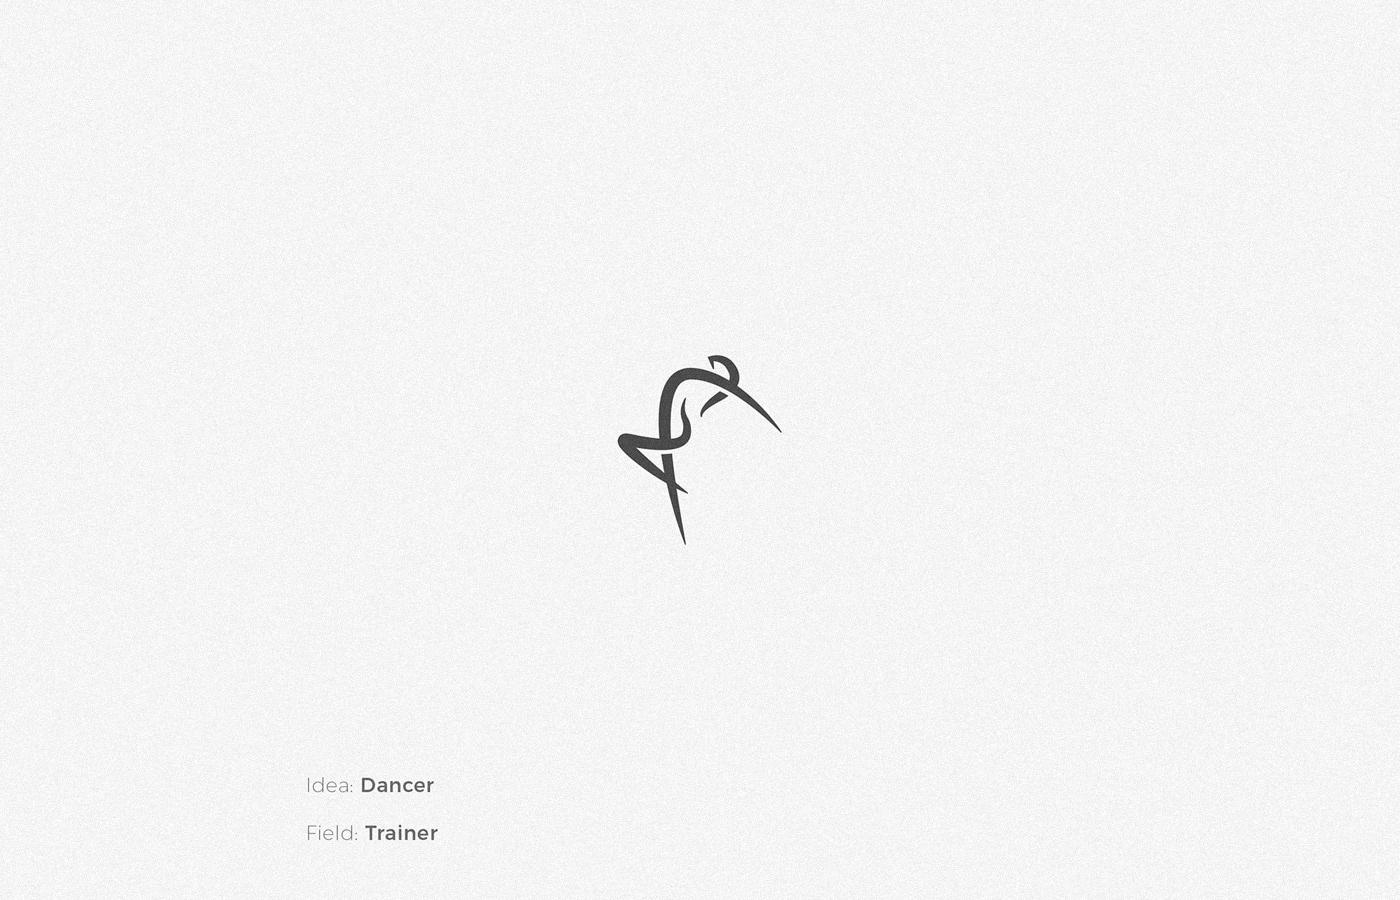 Dancer logo design by Anh Do - Anhdodes